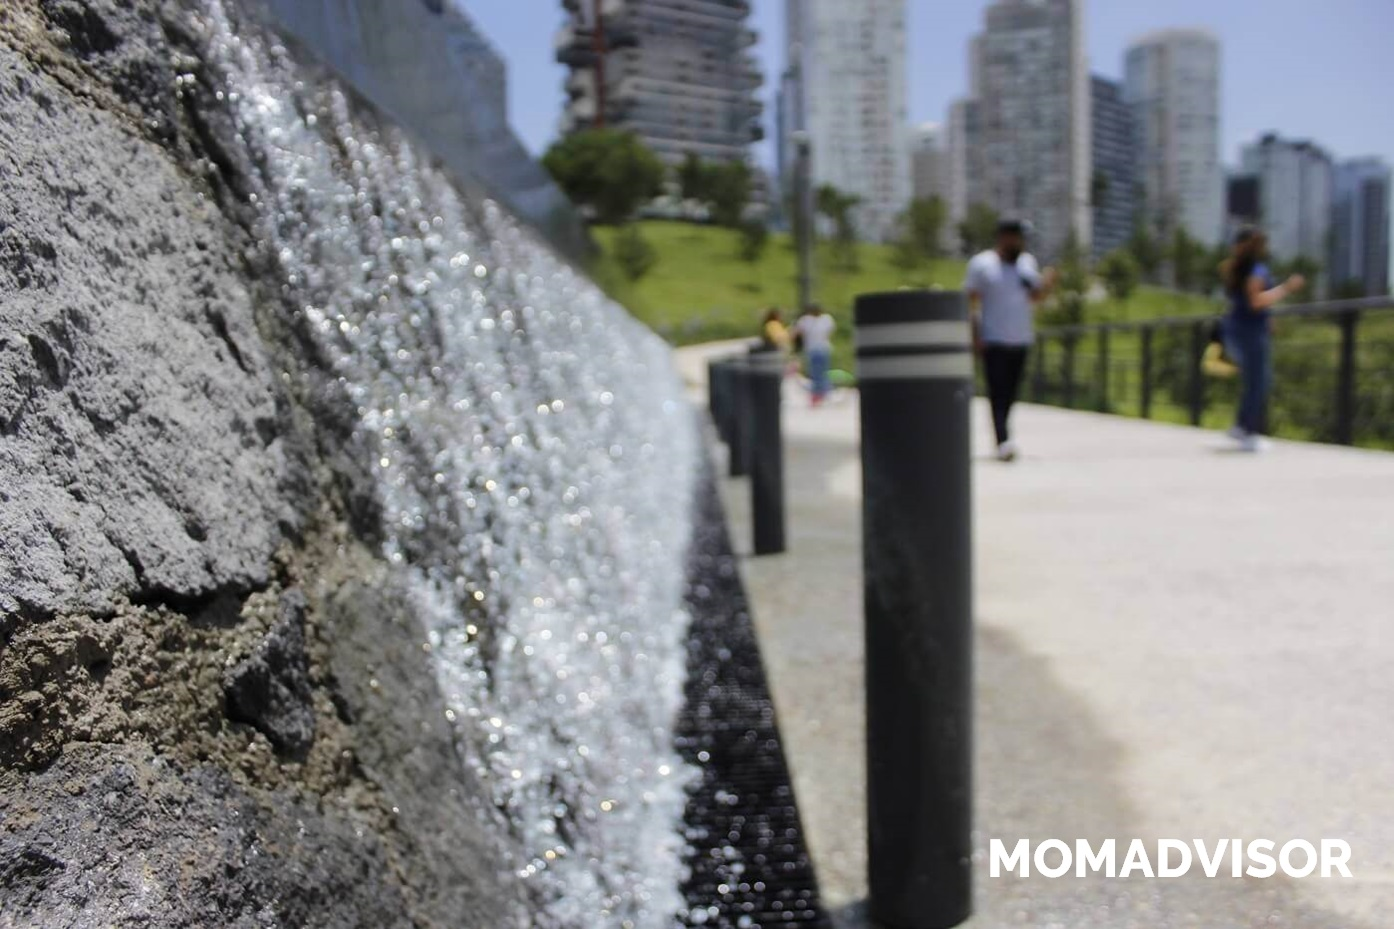 parque-la-mexicana-cascada-momadvisor-logo